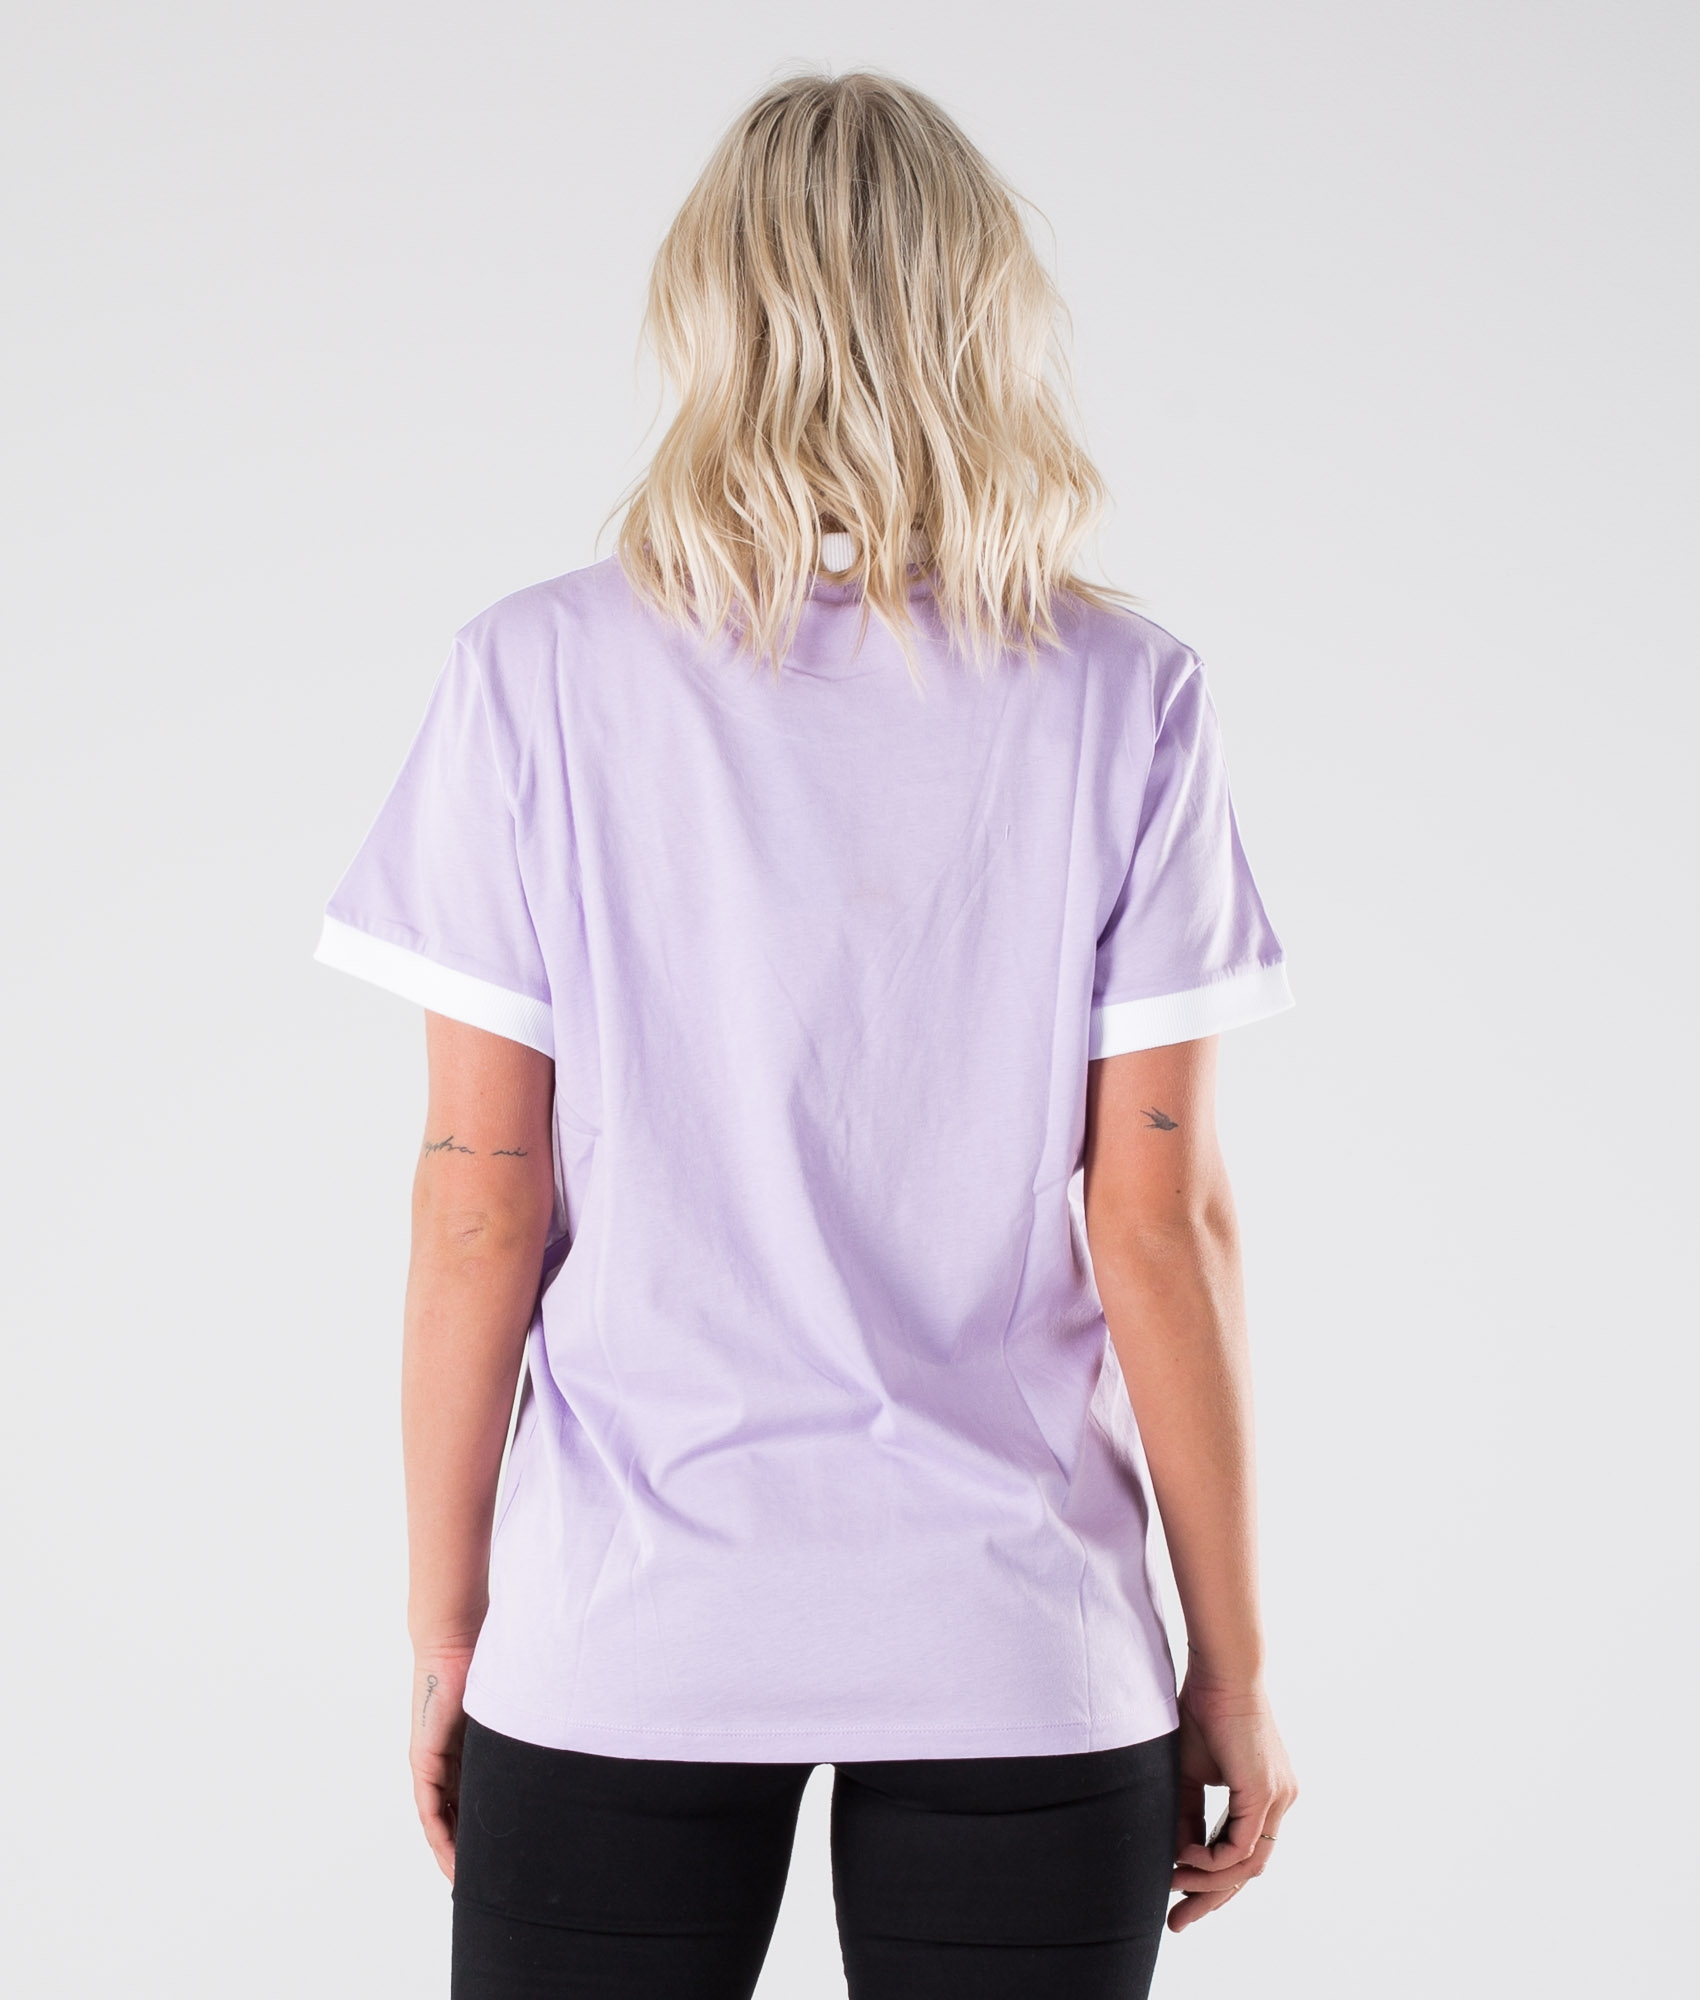 Adidas Originals 3 Stripes T shirt Purple Glow